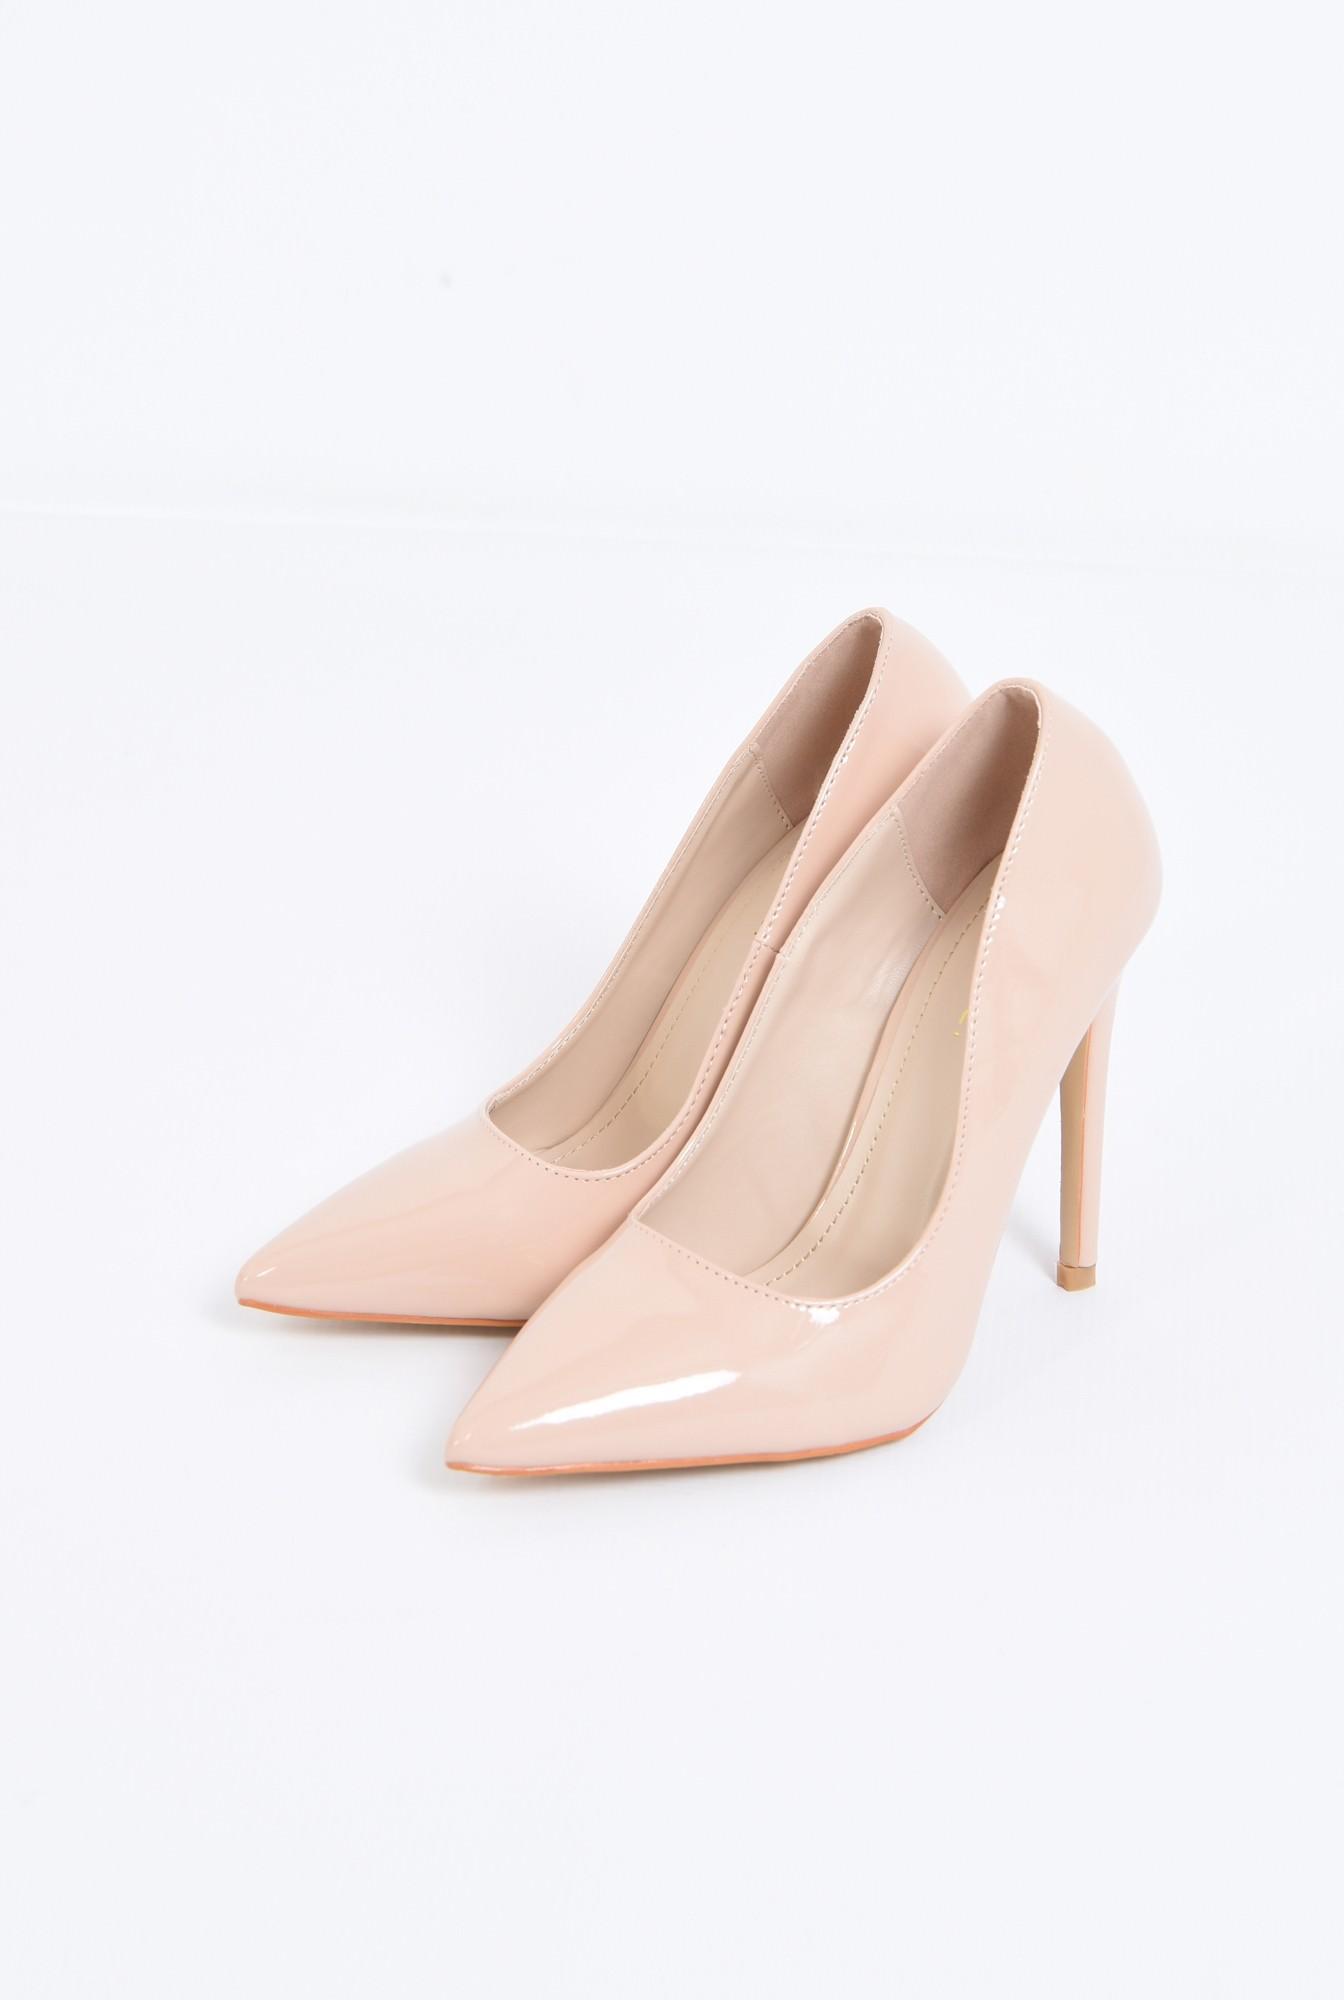 1 - pantofi eleganti, crem, toc inalt, varf ascutit